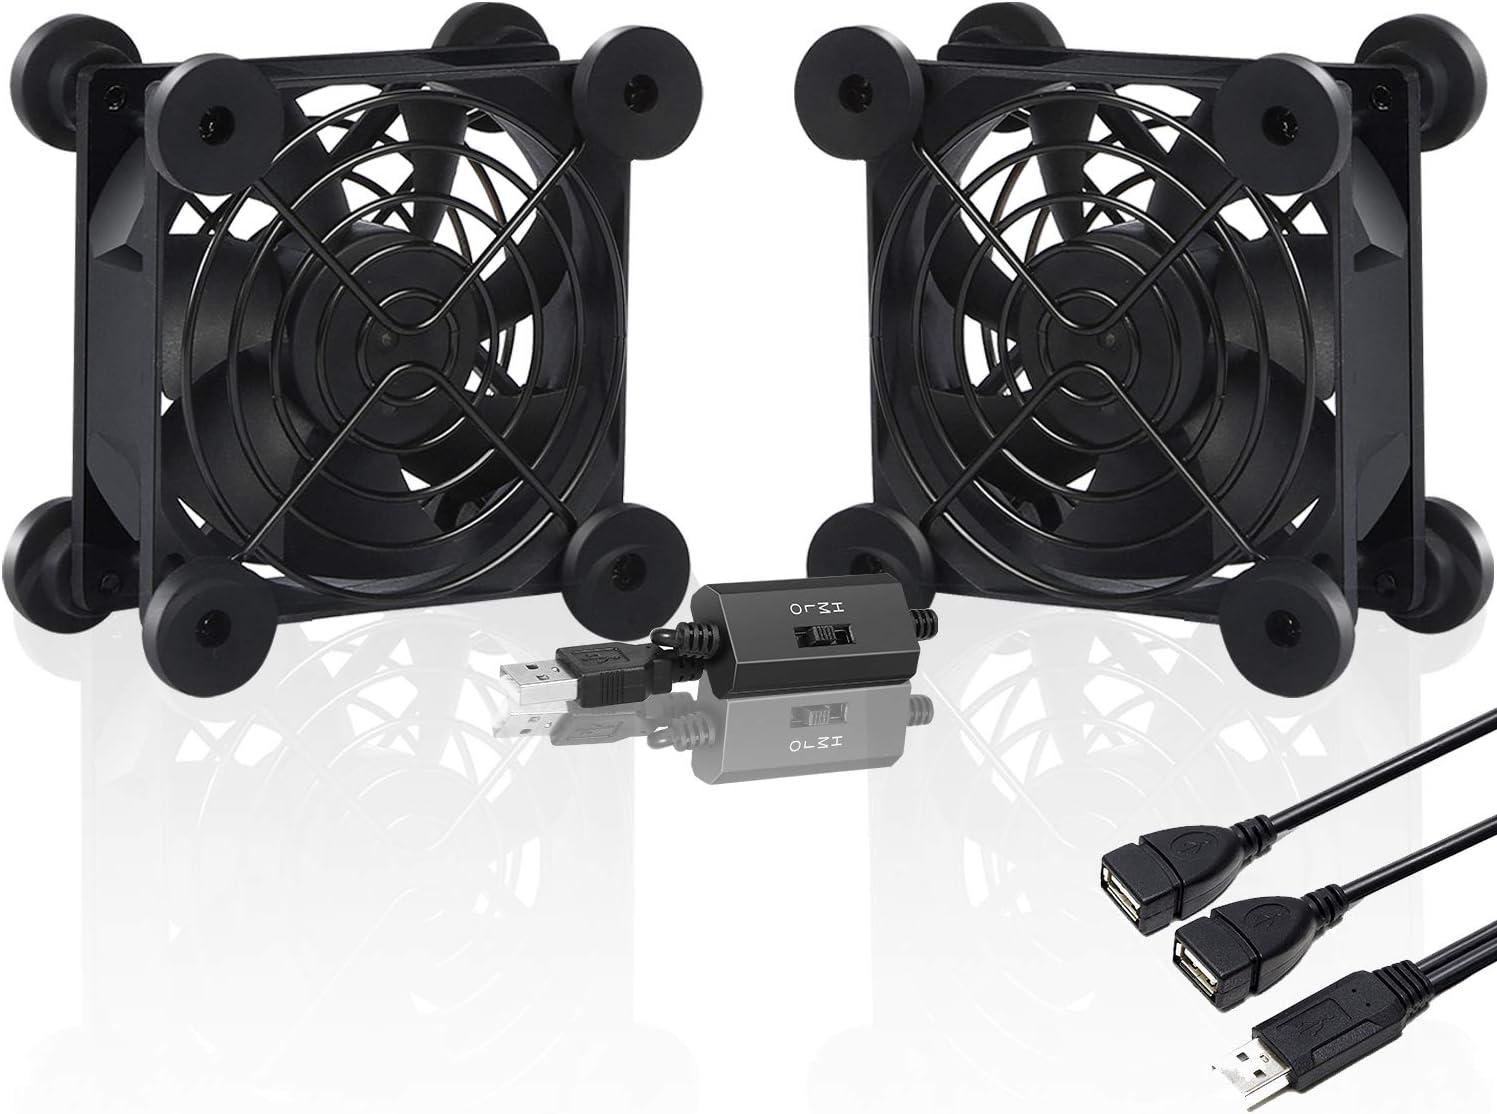 upHere U80 USB Fan 80mm Silent Fan with 3 Adjustable Wind speeds Compatible with Computer / PS4 / TV Box/AV Cabinet,U804